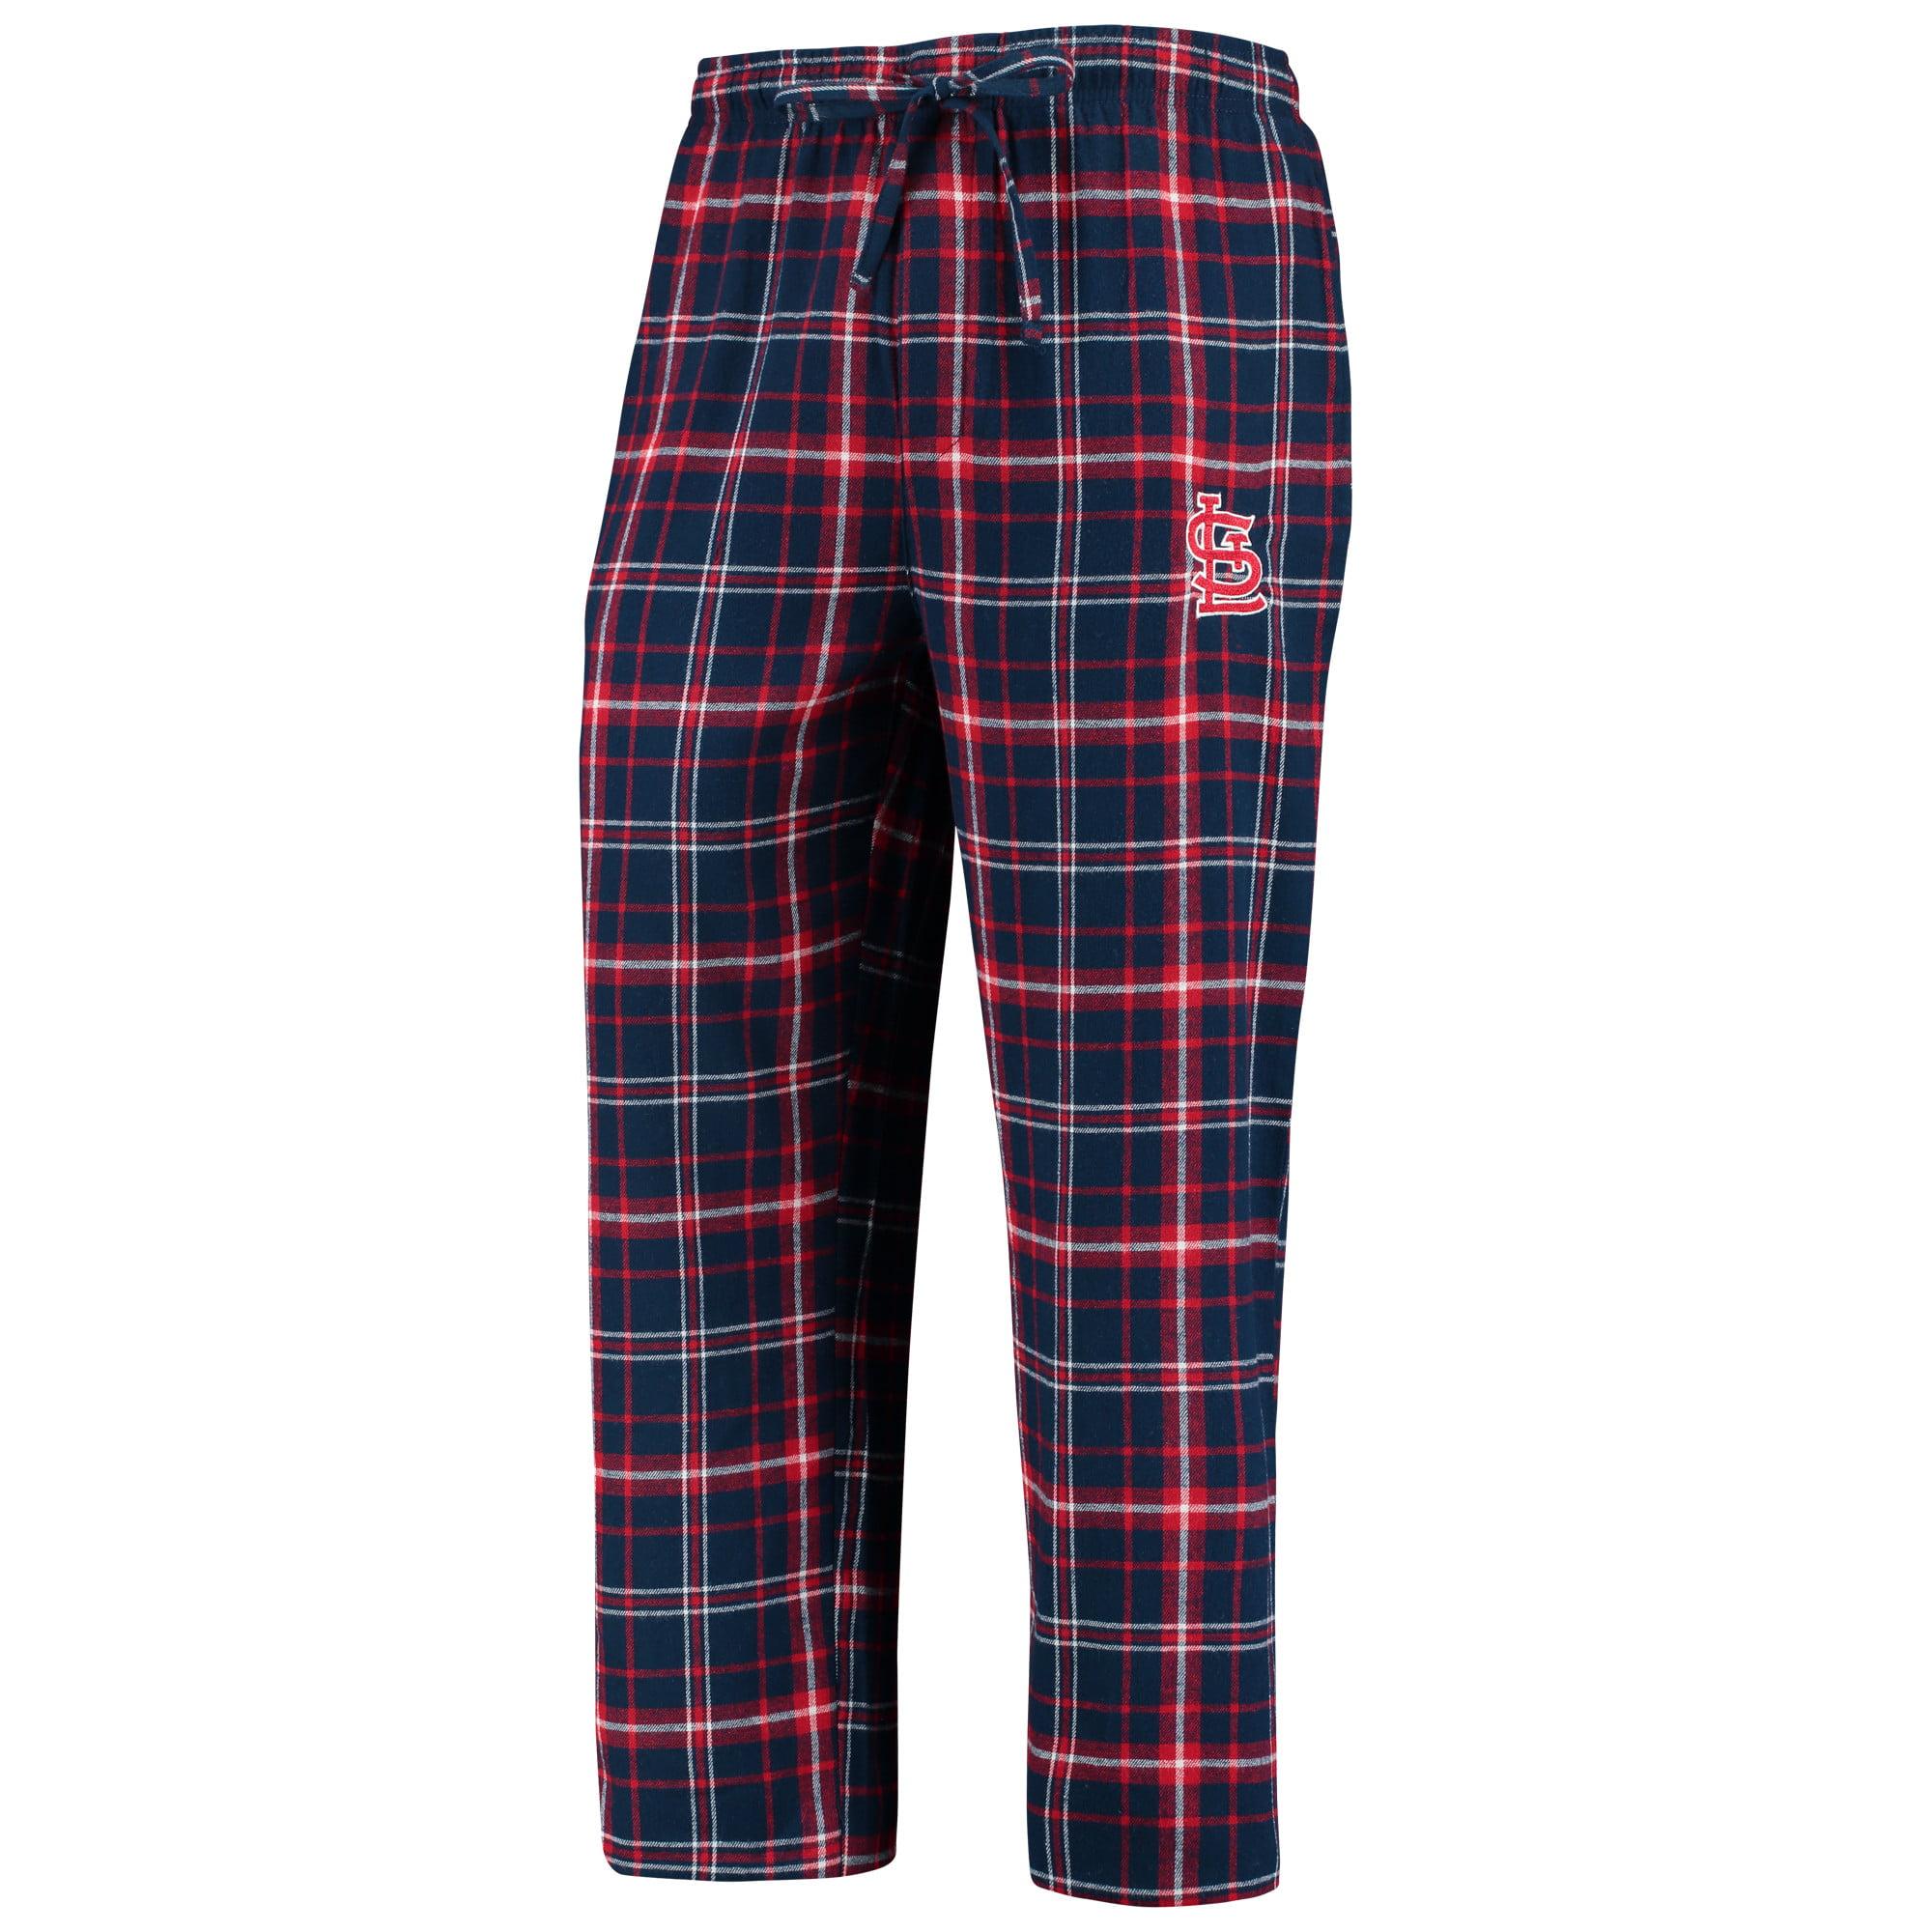 St. Louis Cardinals Concepts Sport Team Ultimate Plaid Flannel Pants - Navy/Red